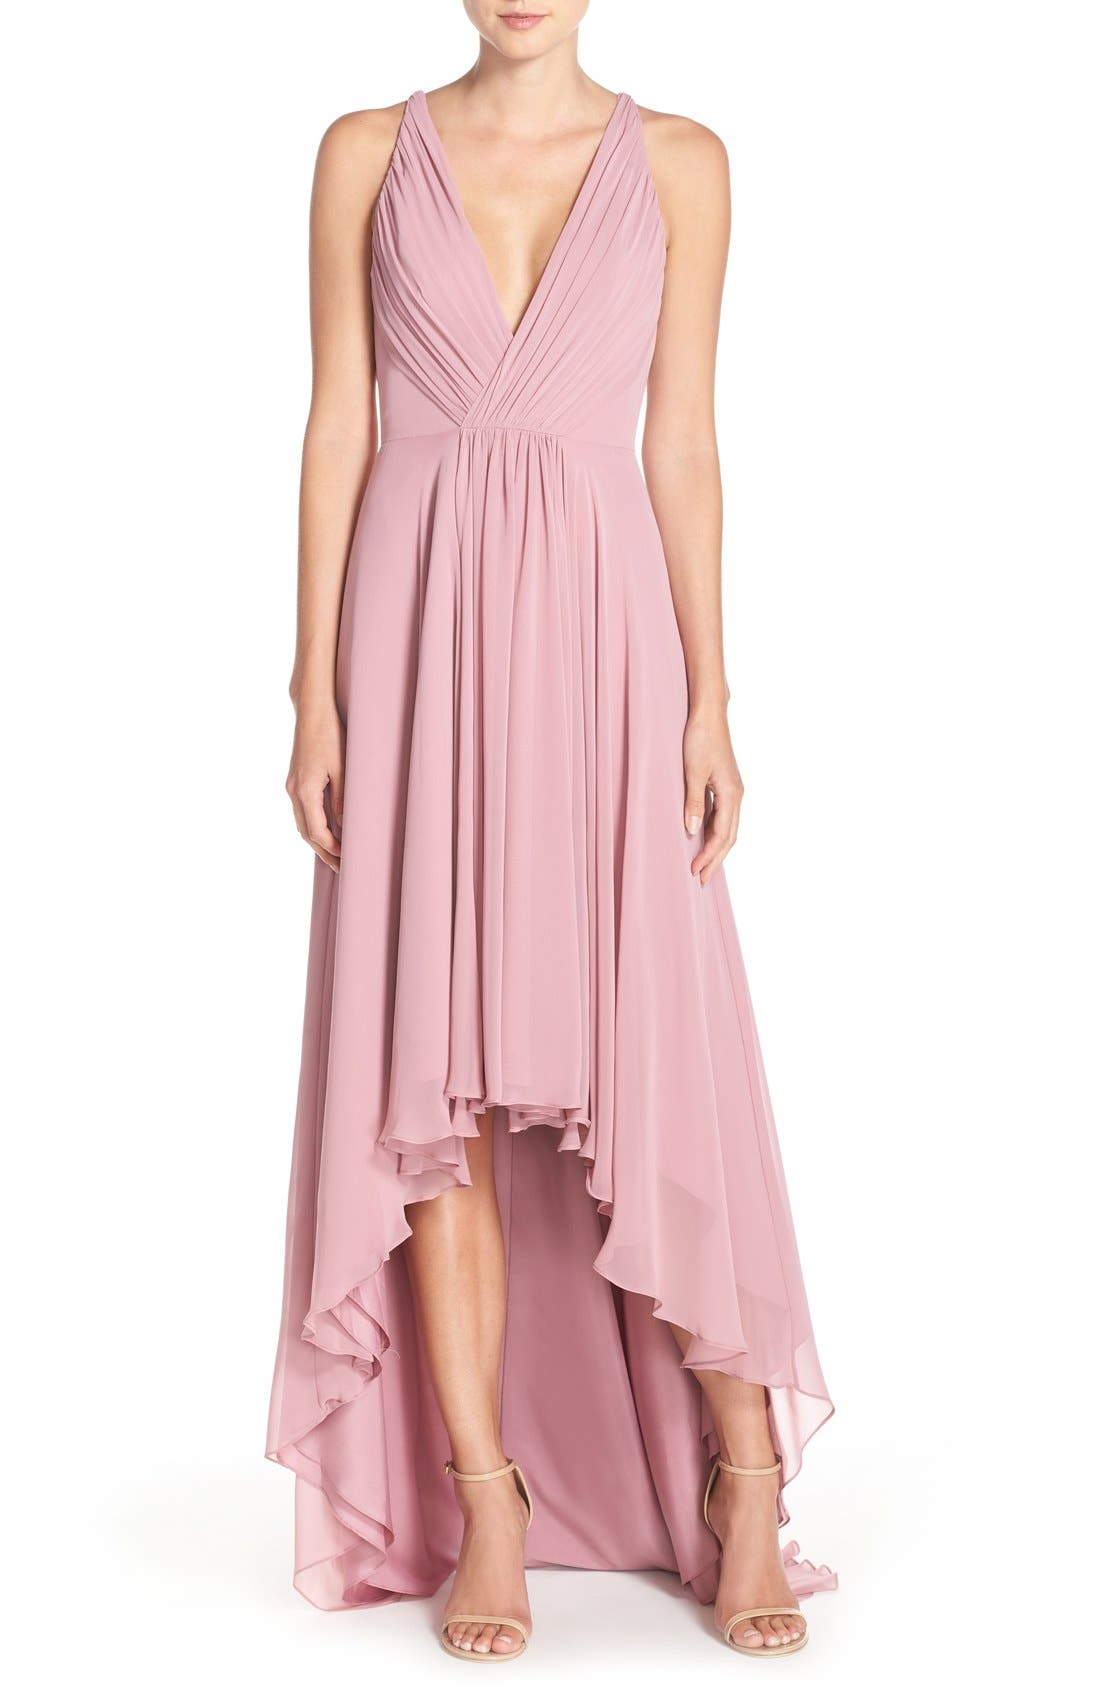 Alternate Image 1 Selected - Monique Lhuillier Bridesmaids Deep V-Neck Chiffon High/Low Gown